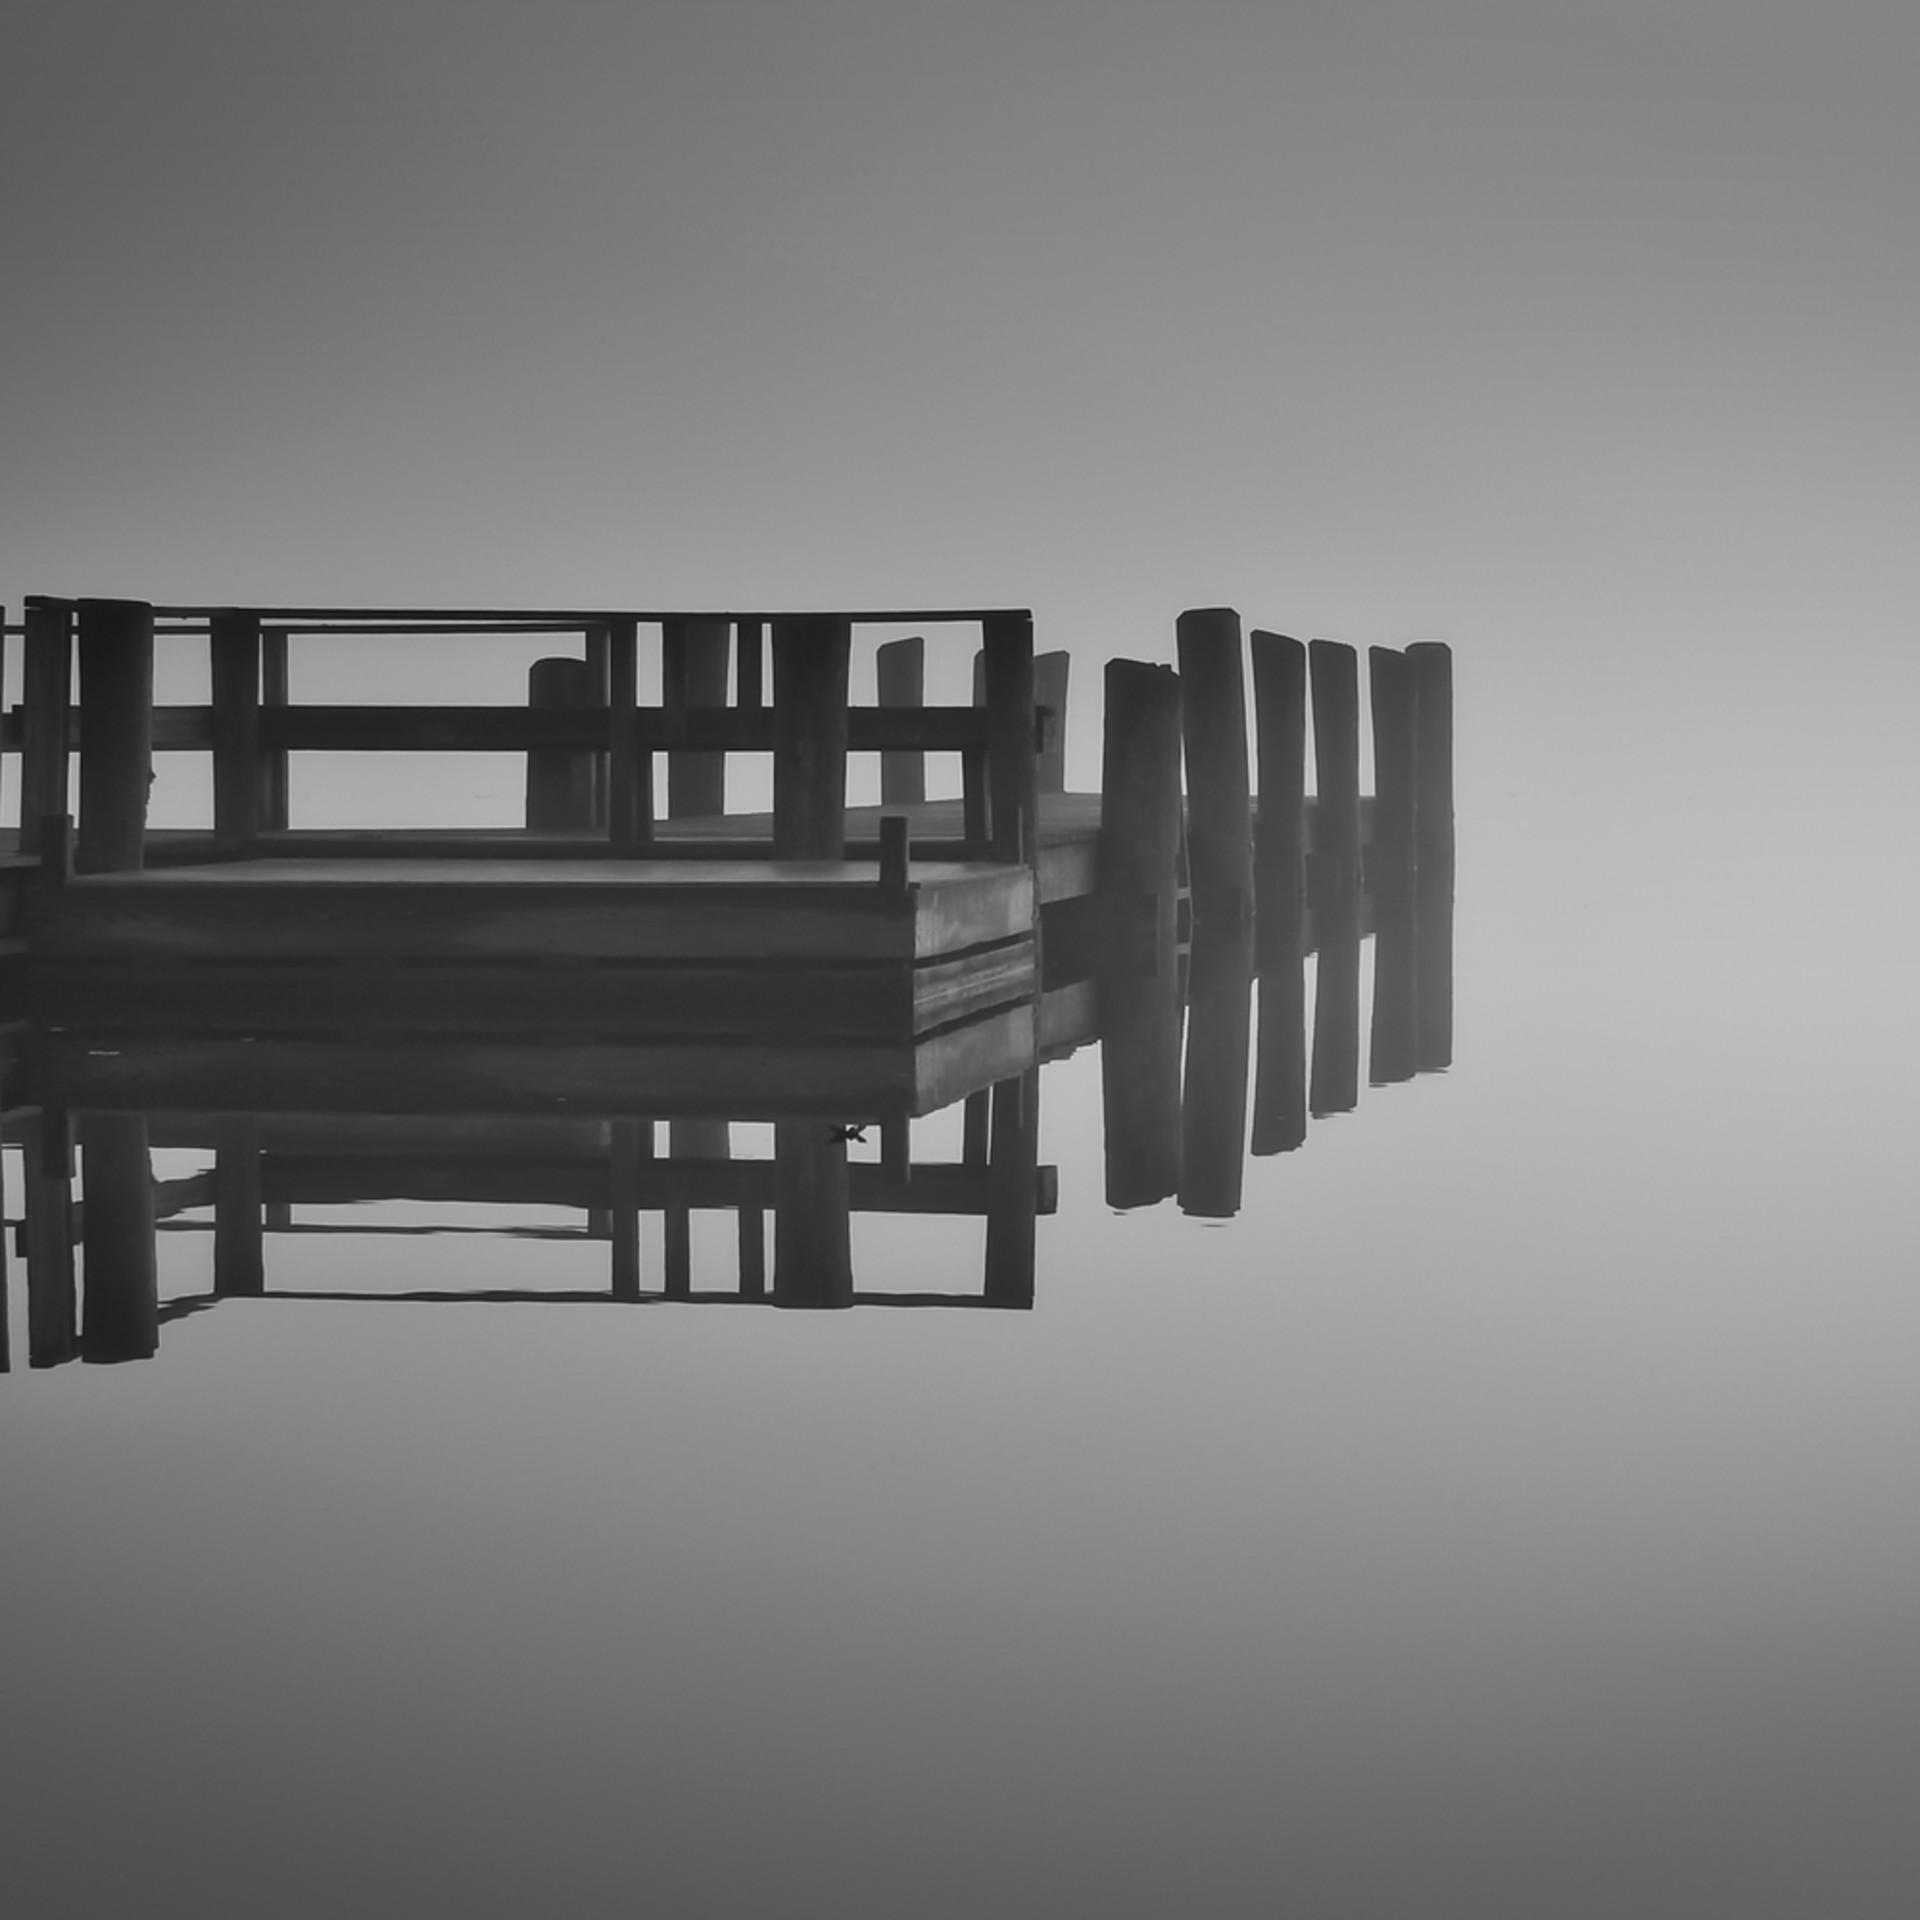 Essex dock   morning fog ryzgsp